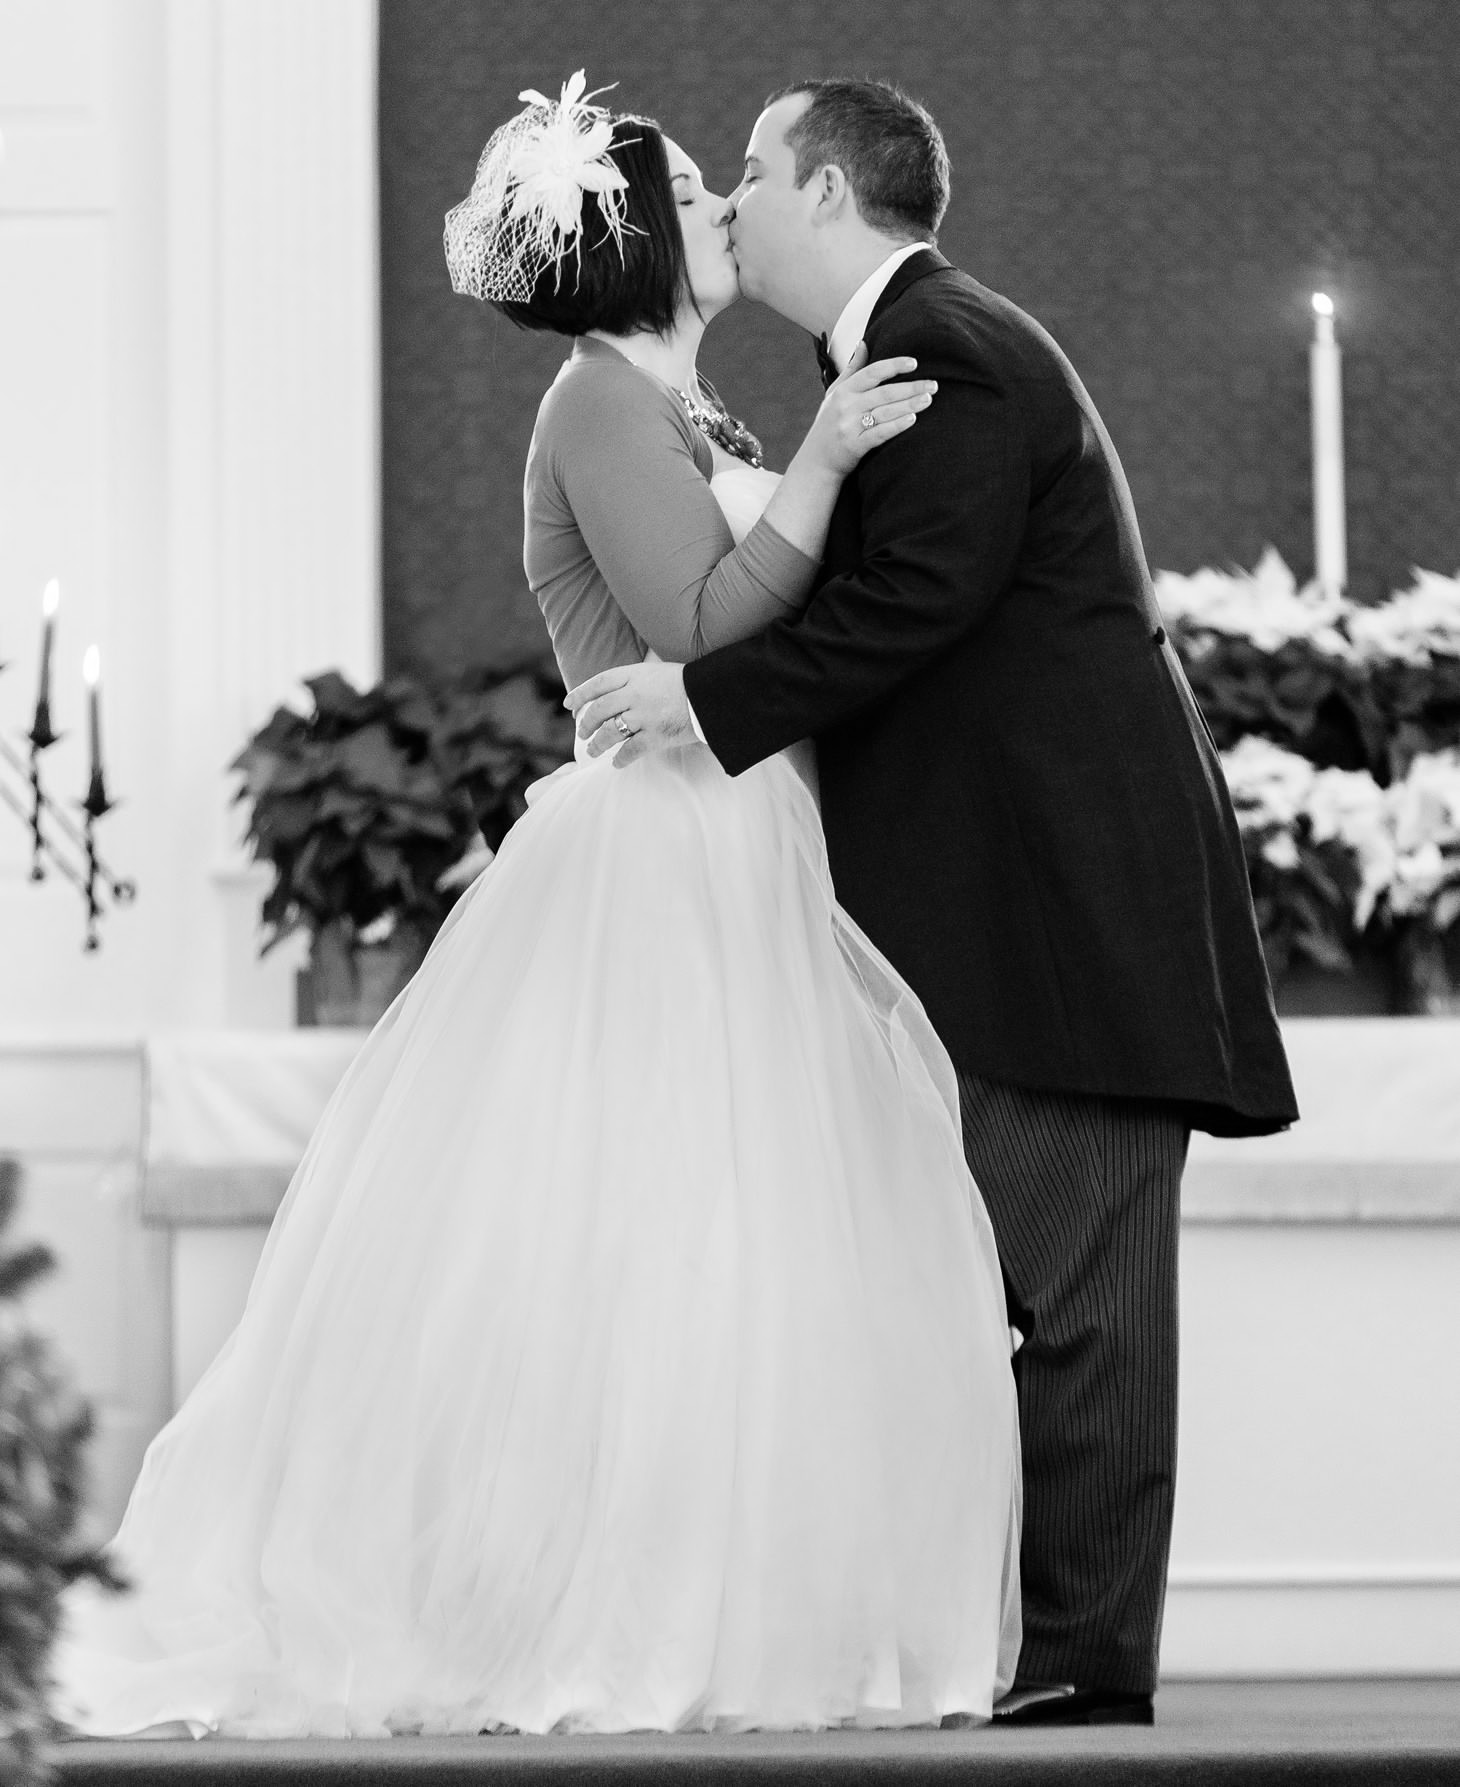 023-nyc-wedding-photographer-smitten-chickens-nj-montclair-art-museum.jpg